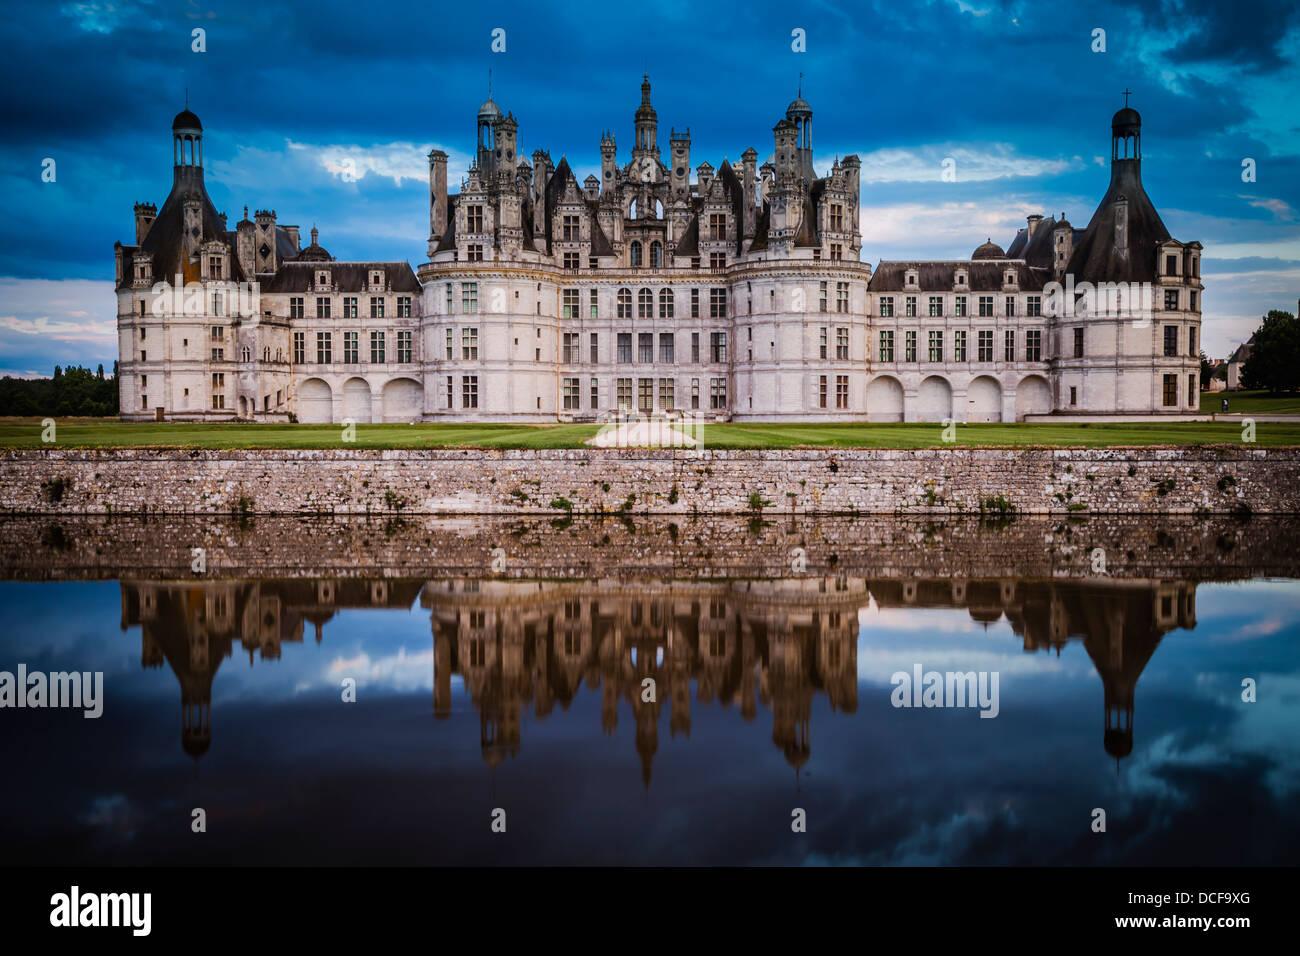 Chateau de Chambord, Loire Valley, Centre France - Stock Image